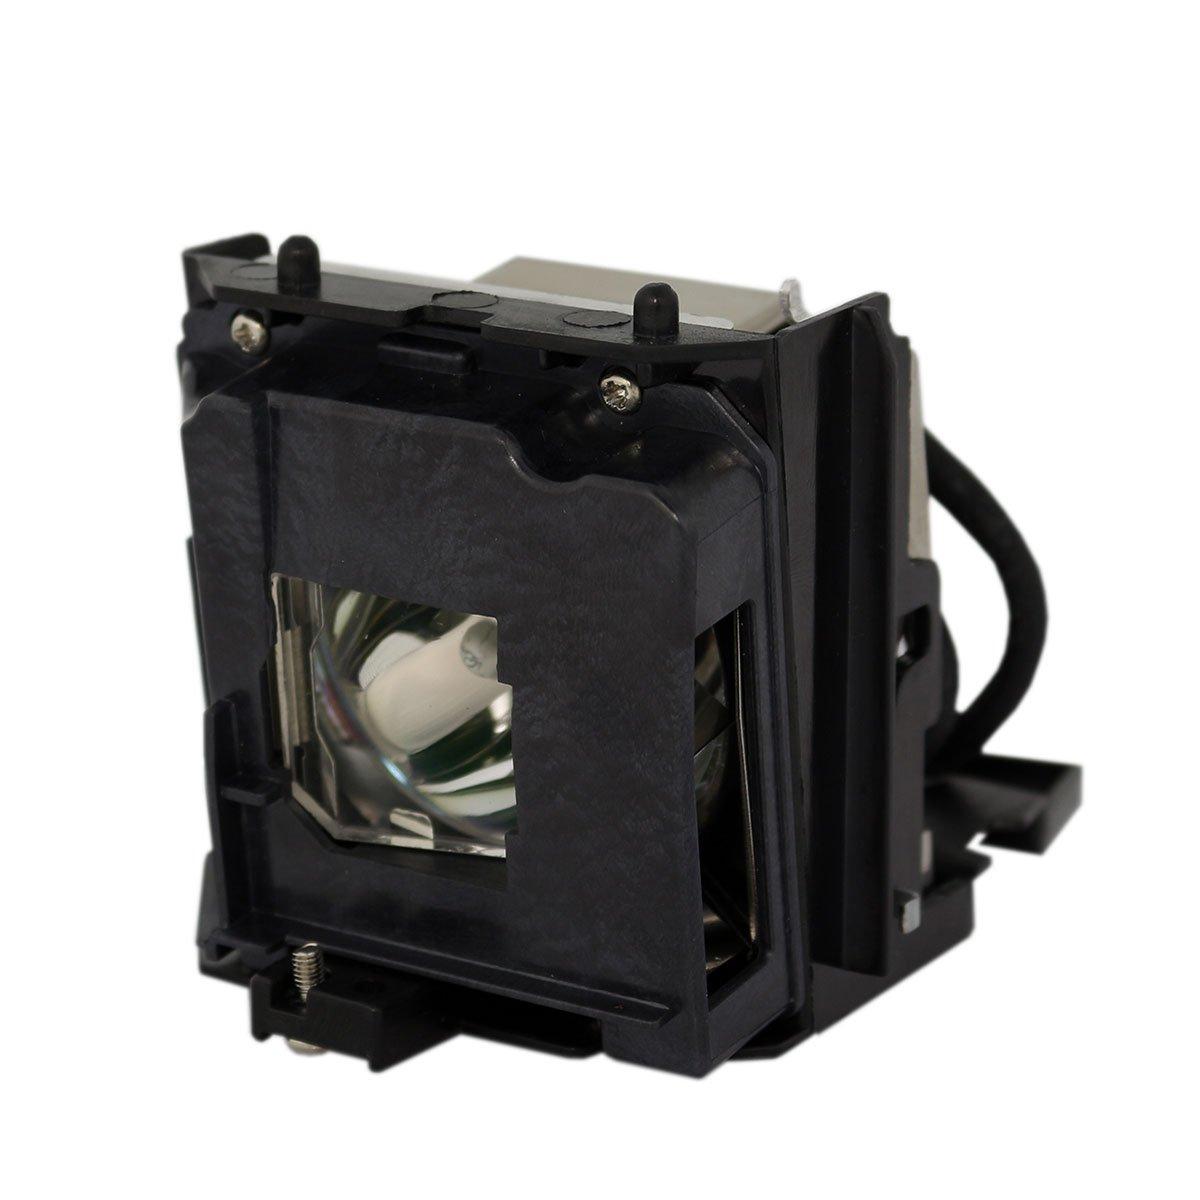 SpArc 交換用プロジェクターランプ 囲い/電球付き Sharp PG-F325W用 Platinum (Brighter/Durable) B07MPWT19Y Lamp with Housing Platinum (Brighter/Durable)